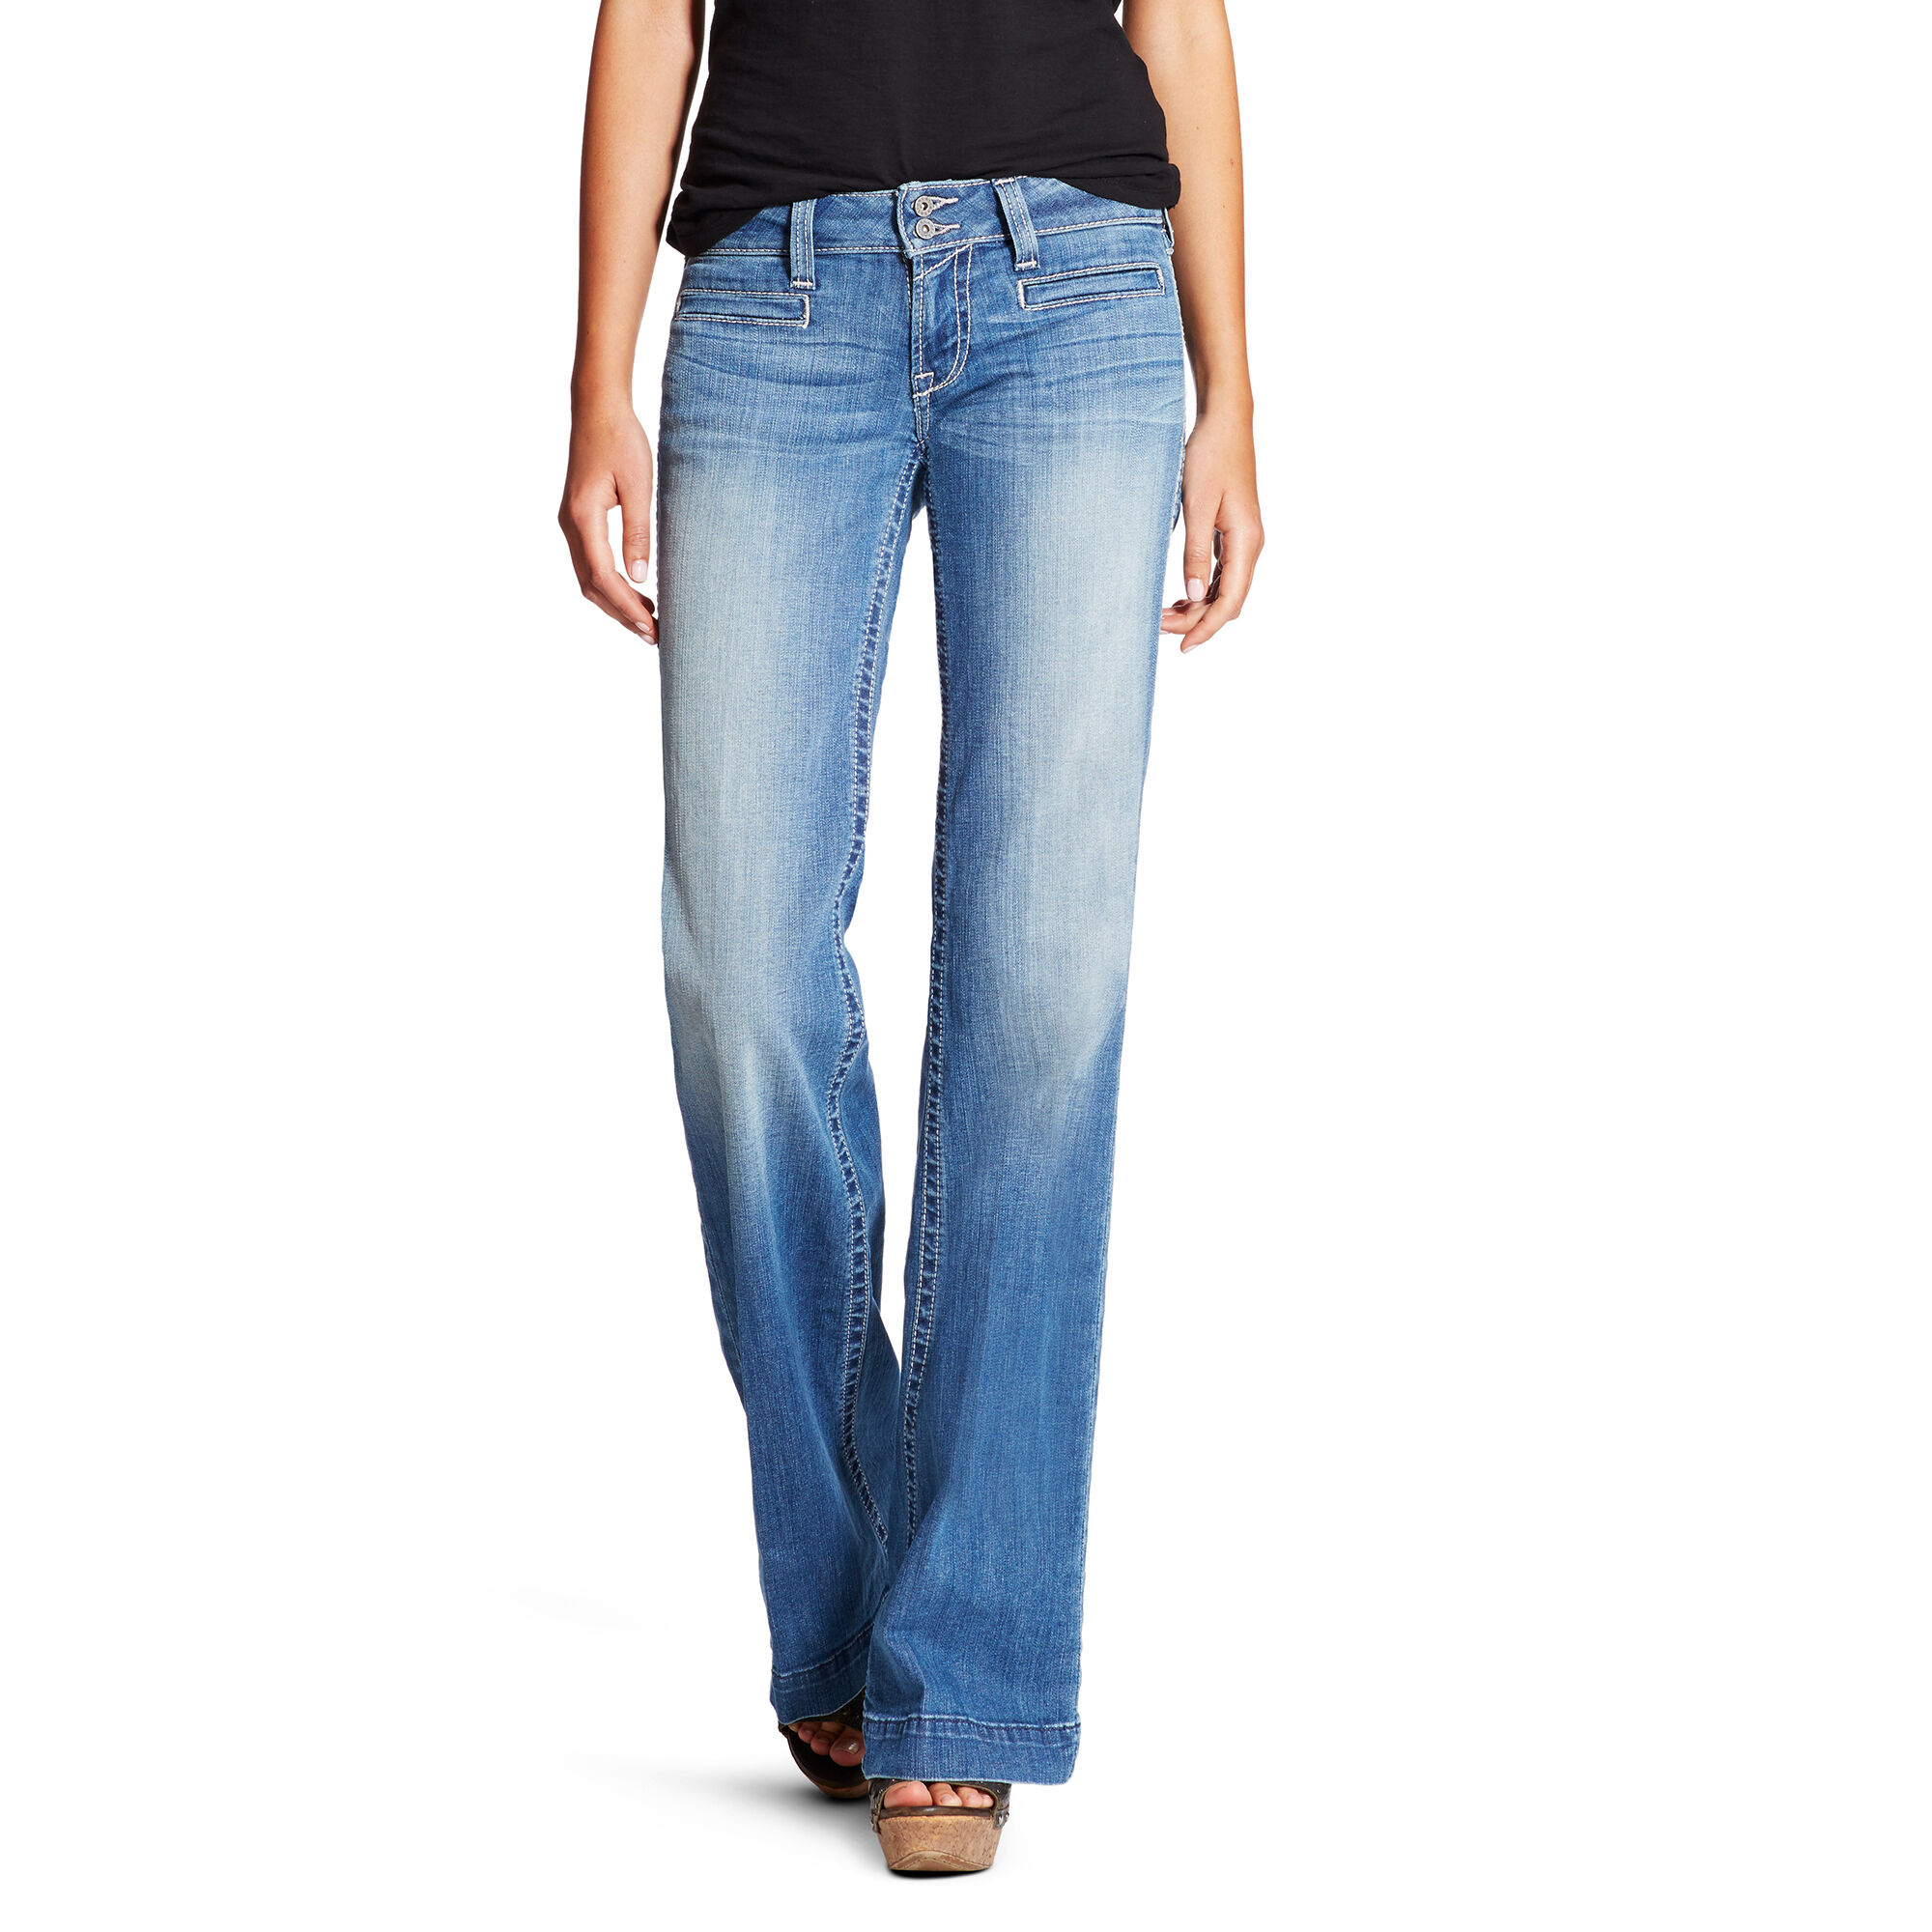 Outseam Ella Wide Leg Trouser Jean